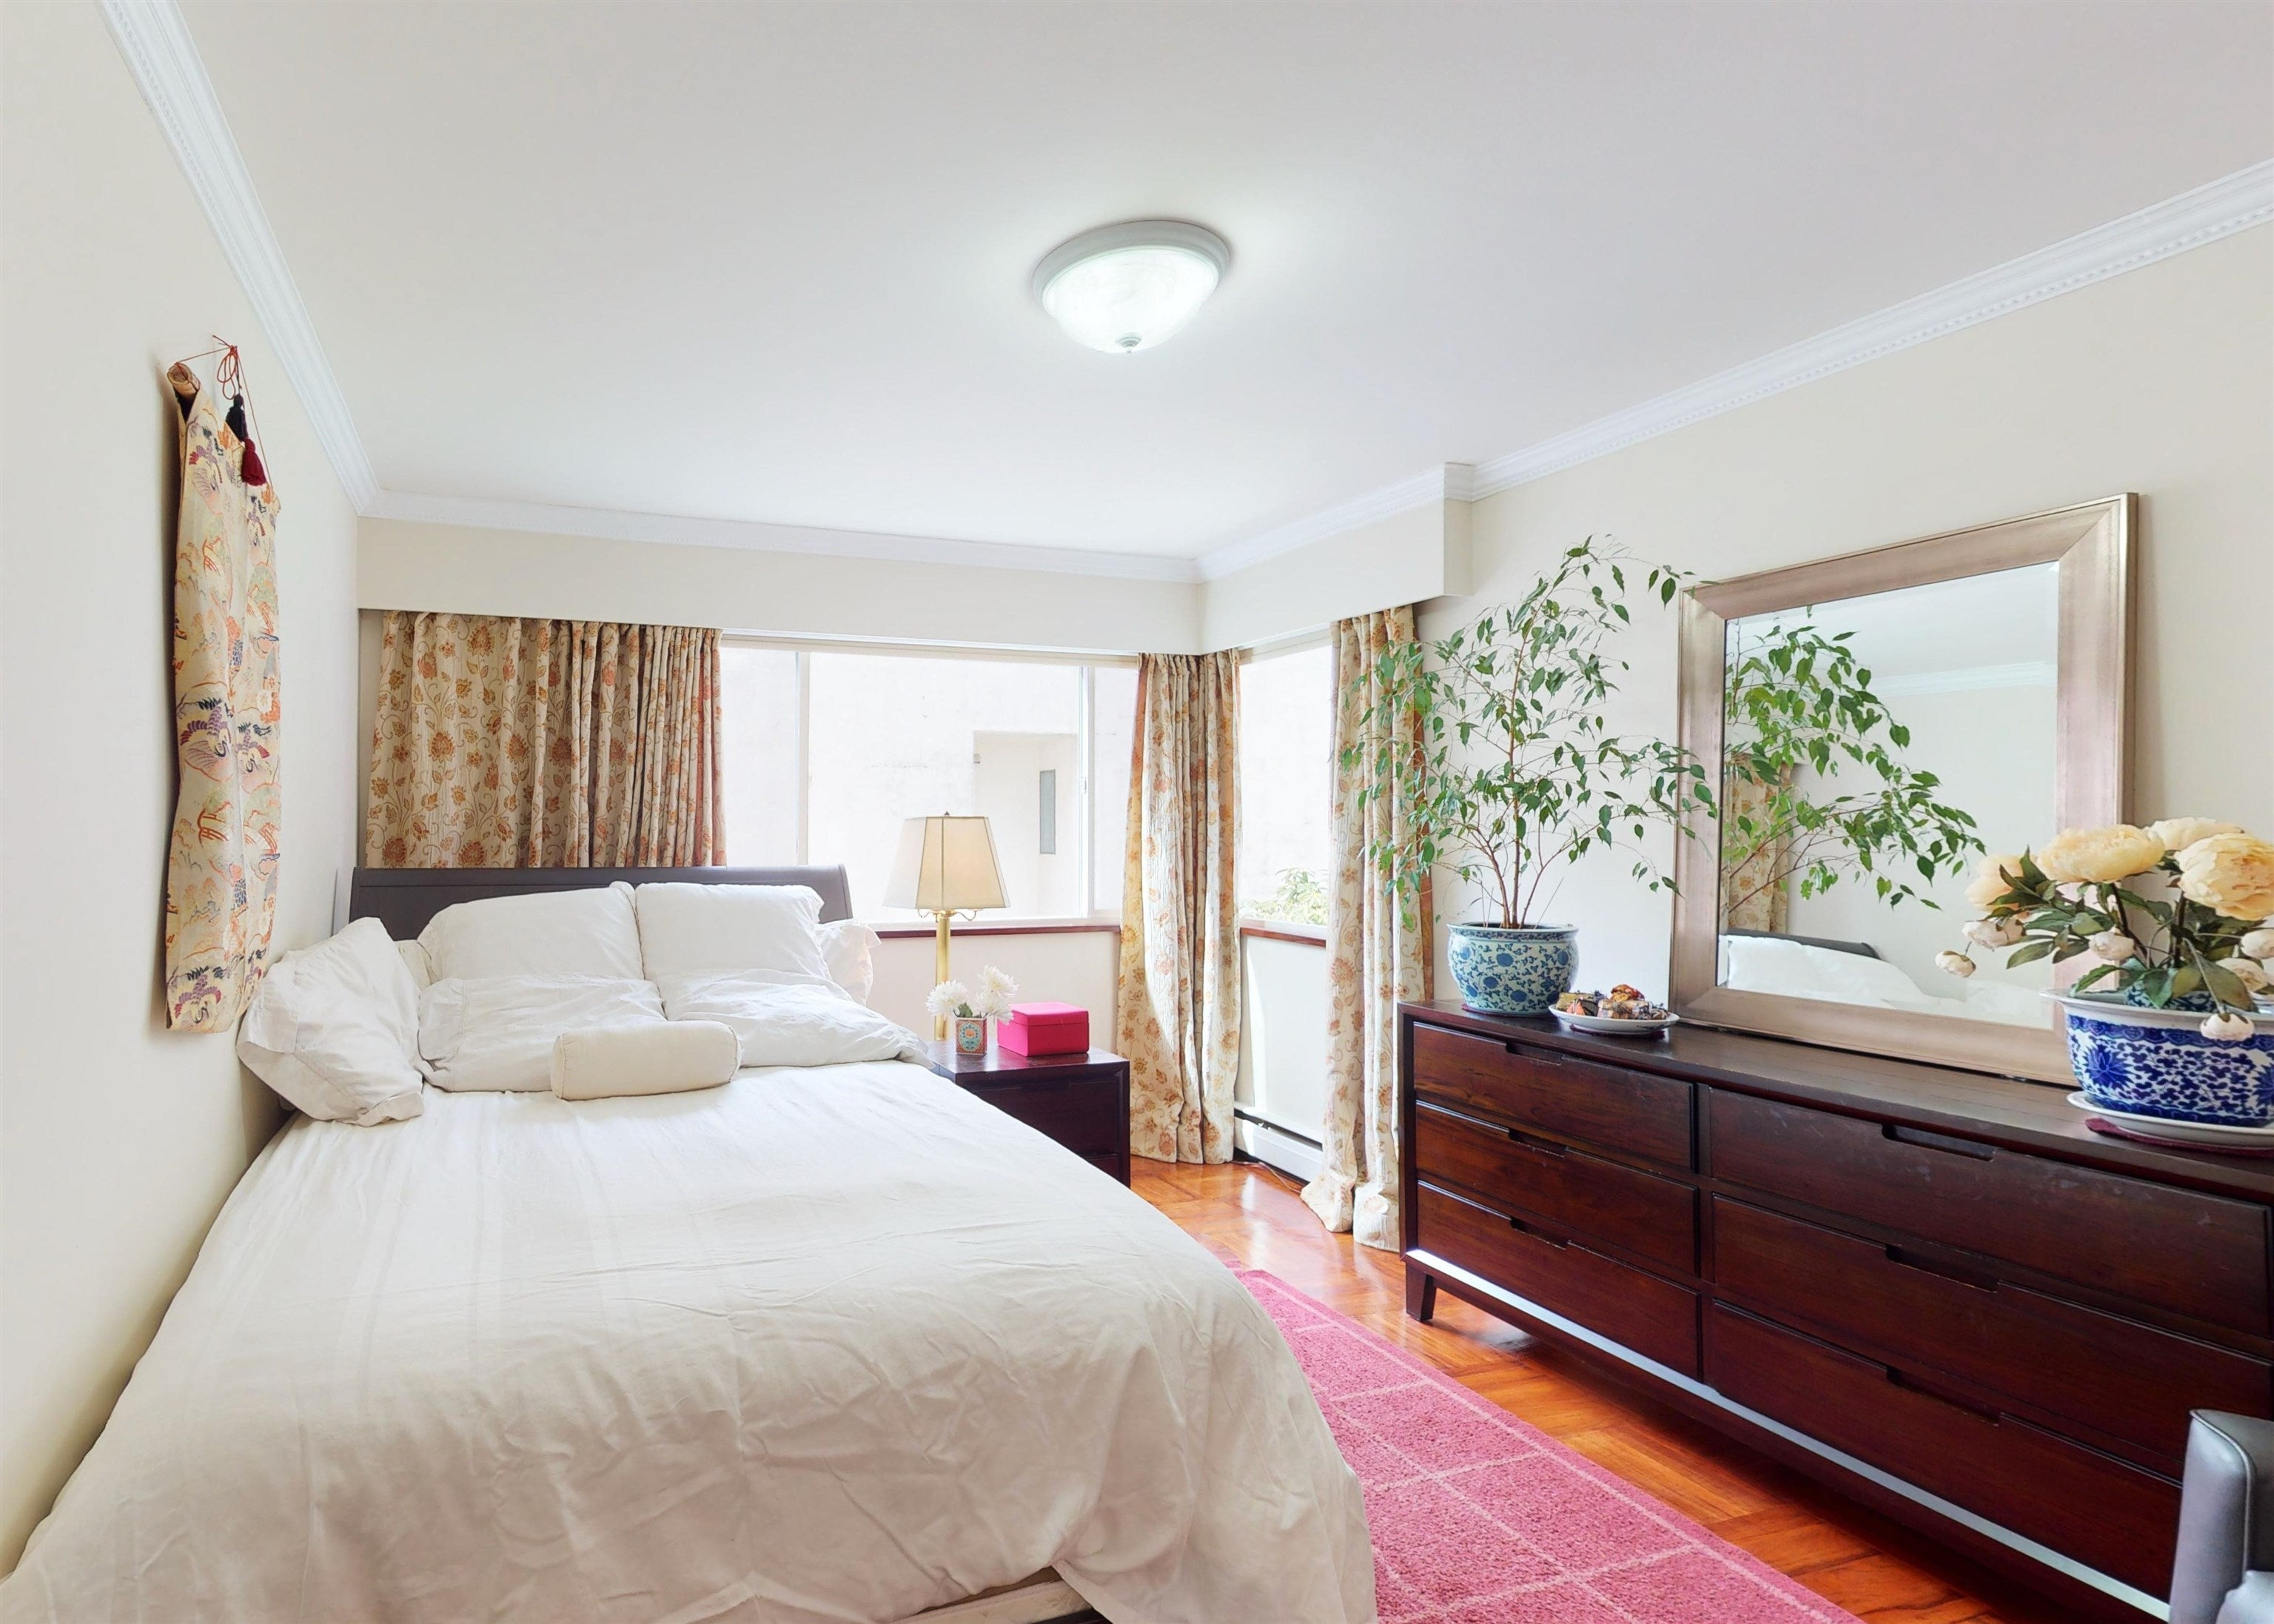 202 1750 ESQUIMALT AVENUE - Ambleside Apartment/Condo for sale, 1 Bedroom (R2610188) - #16